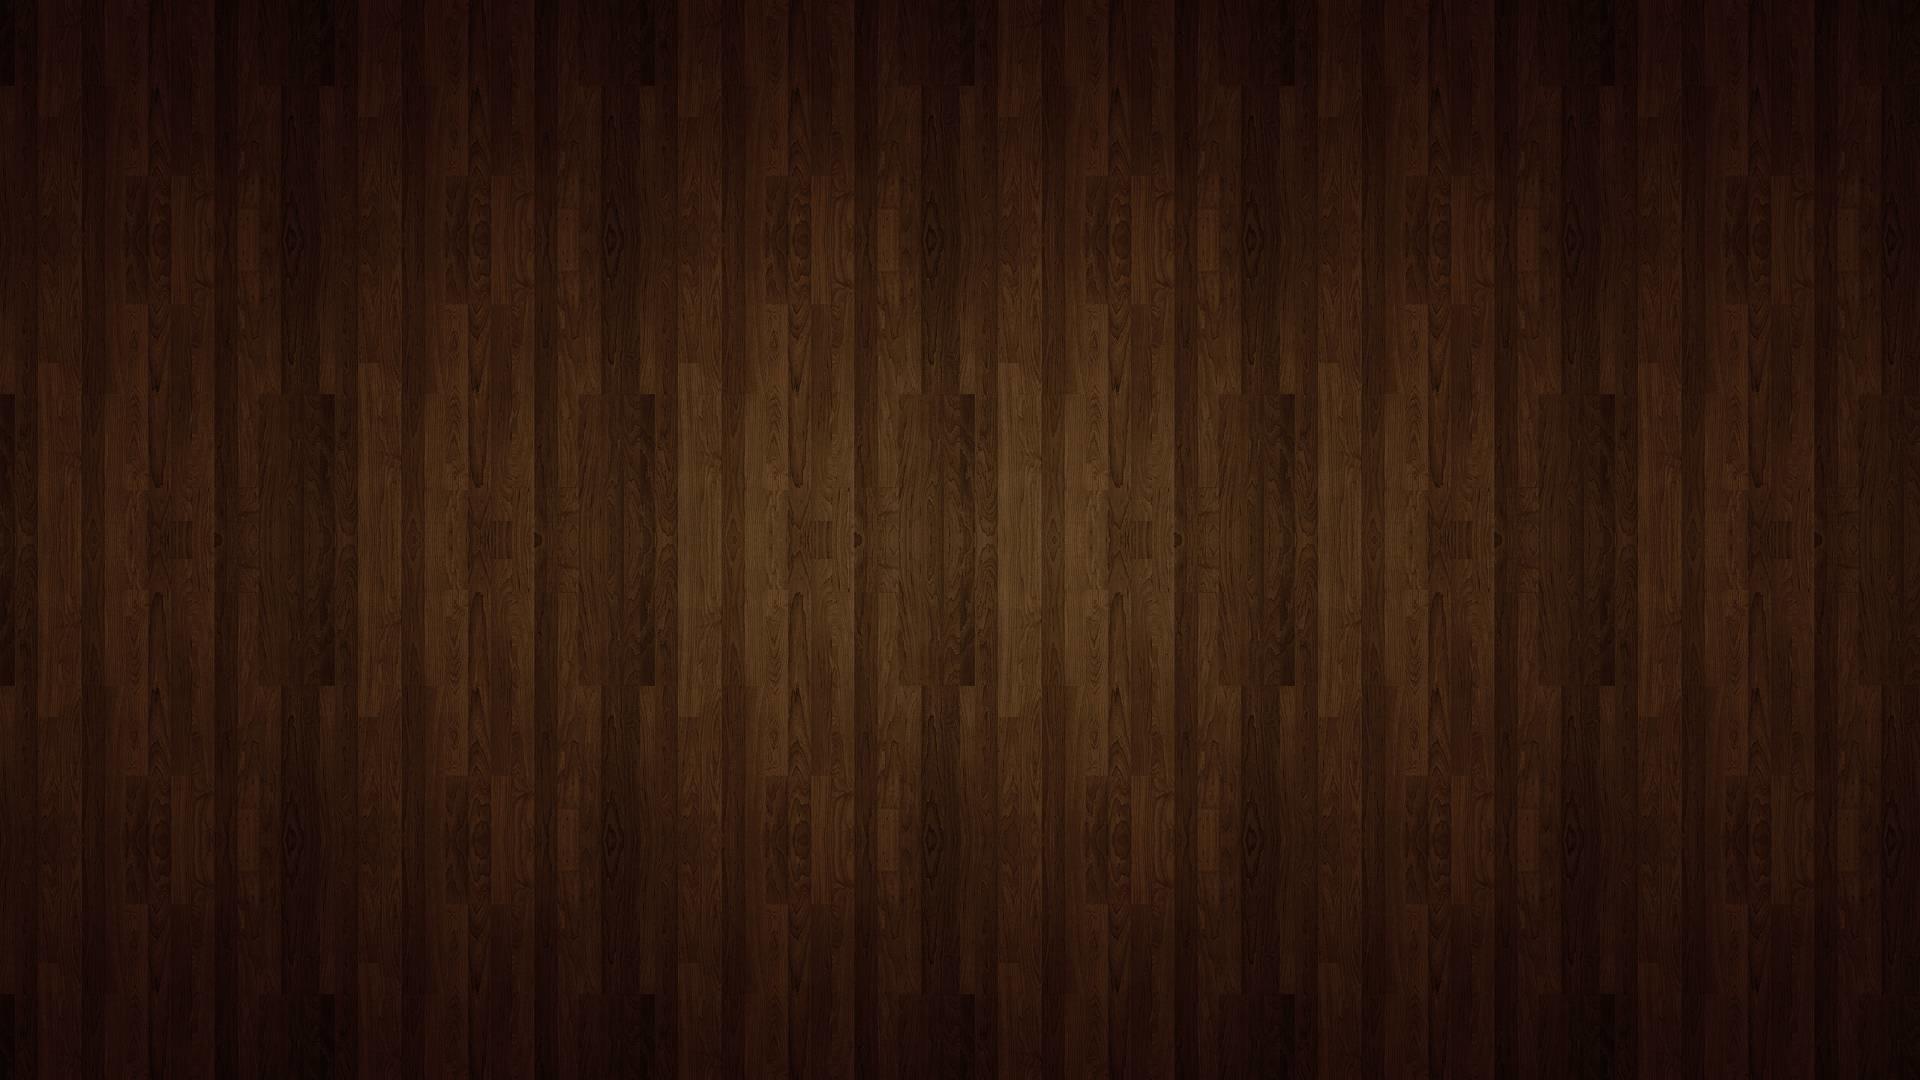 wood-grain-wallpaper-15242-15714-hd-wallpapers | Yogatique Bangkok